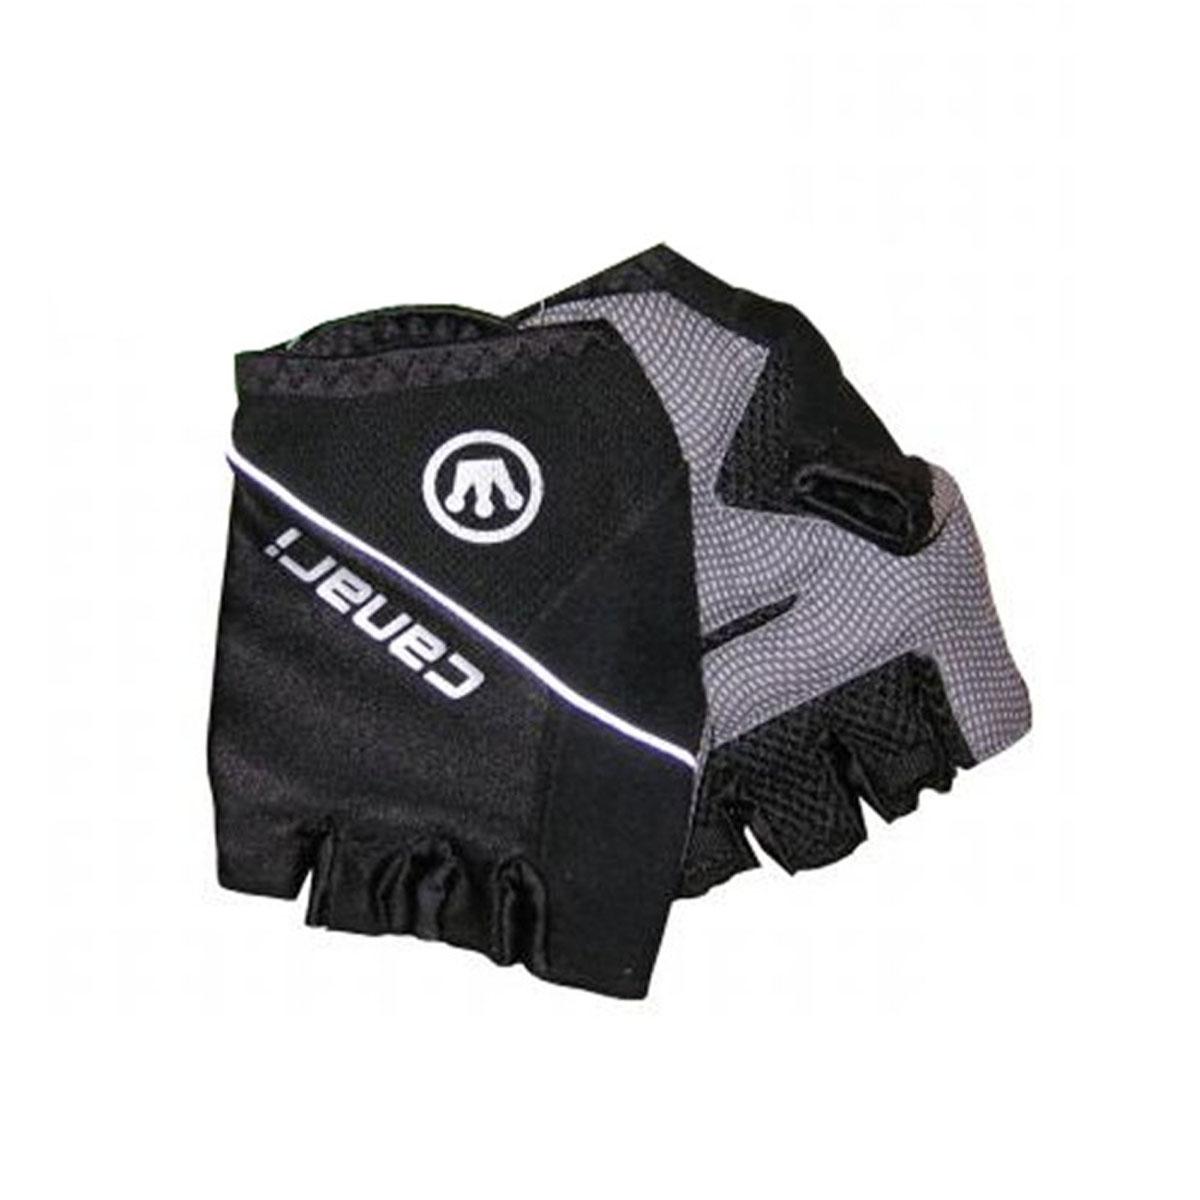 Canari Cyclewear Men's Fusion Short Finger Cycling Gloves - 7020